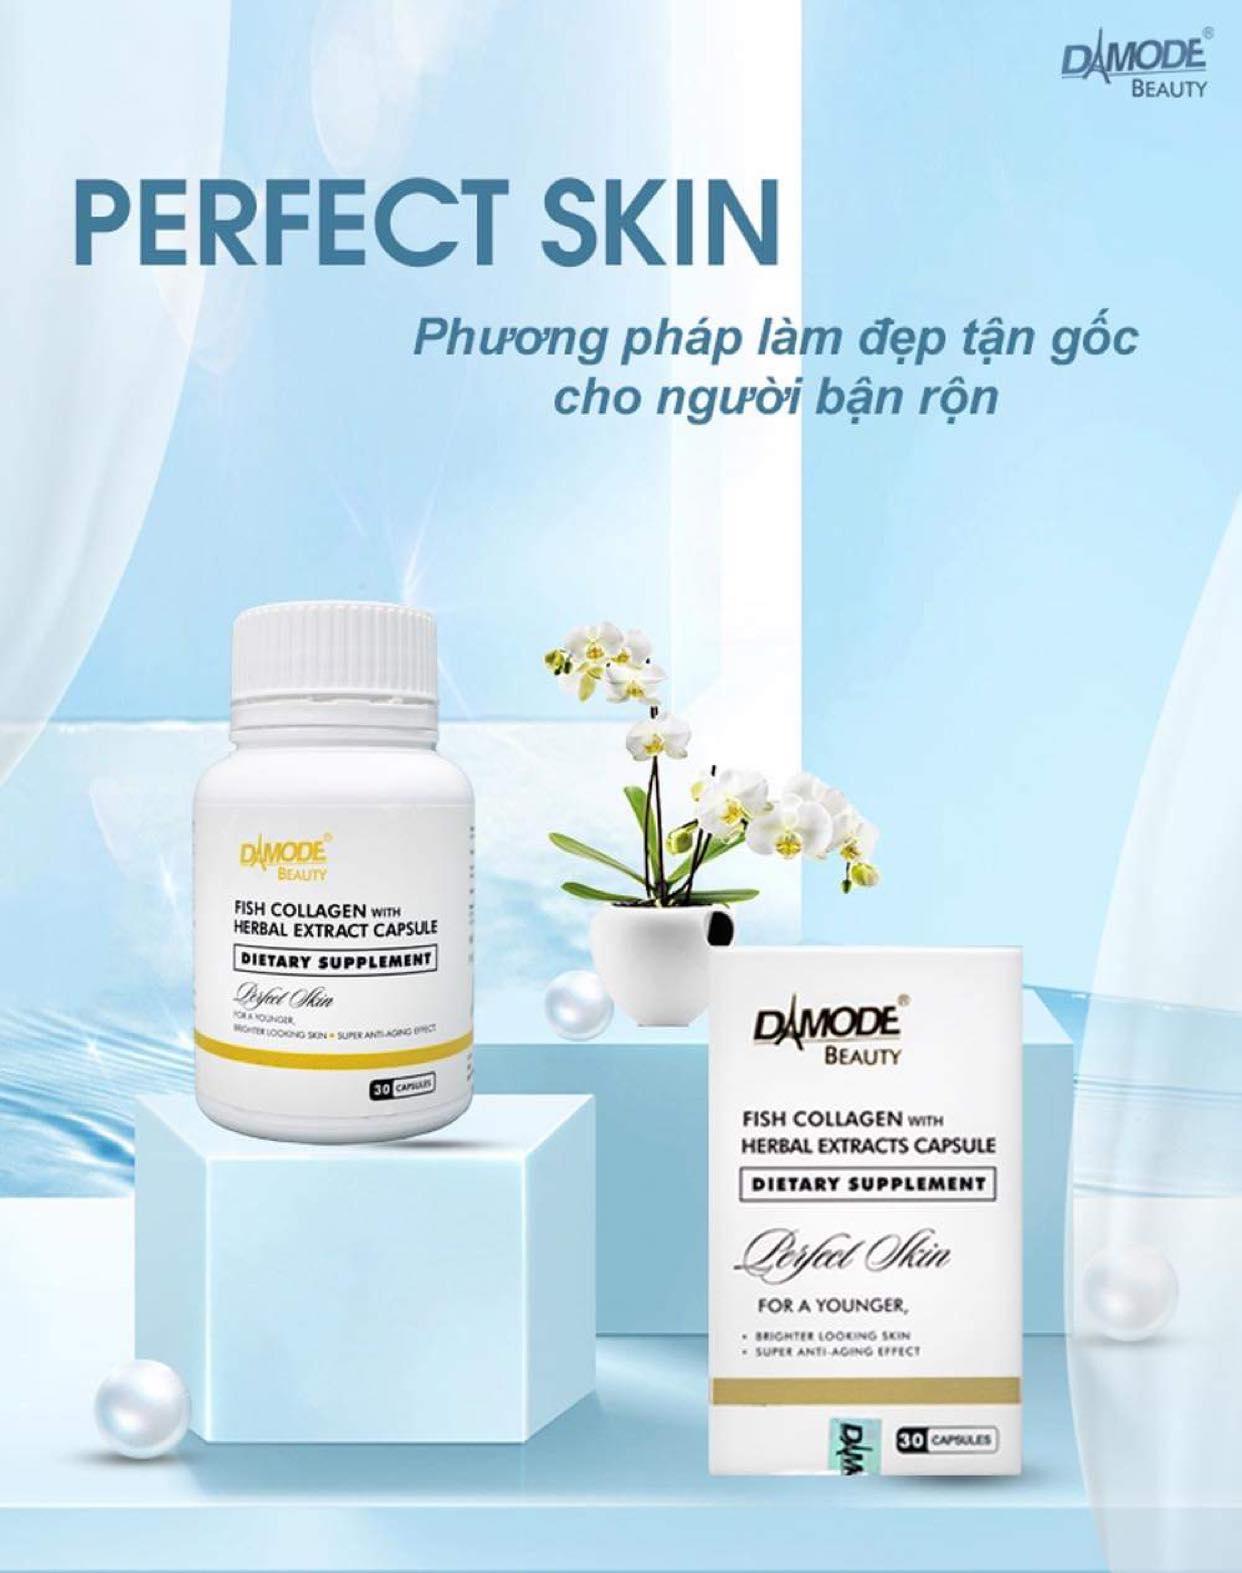 damode-perfect-skin-fish-collagen